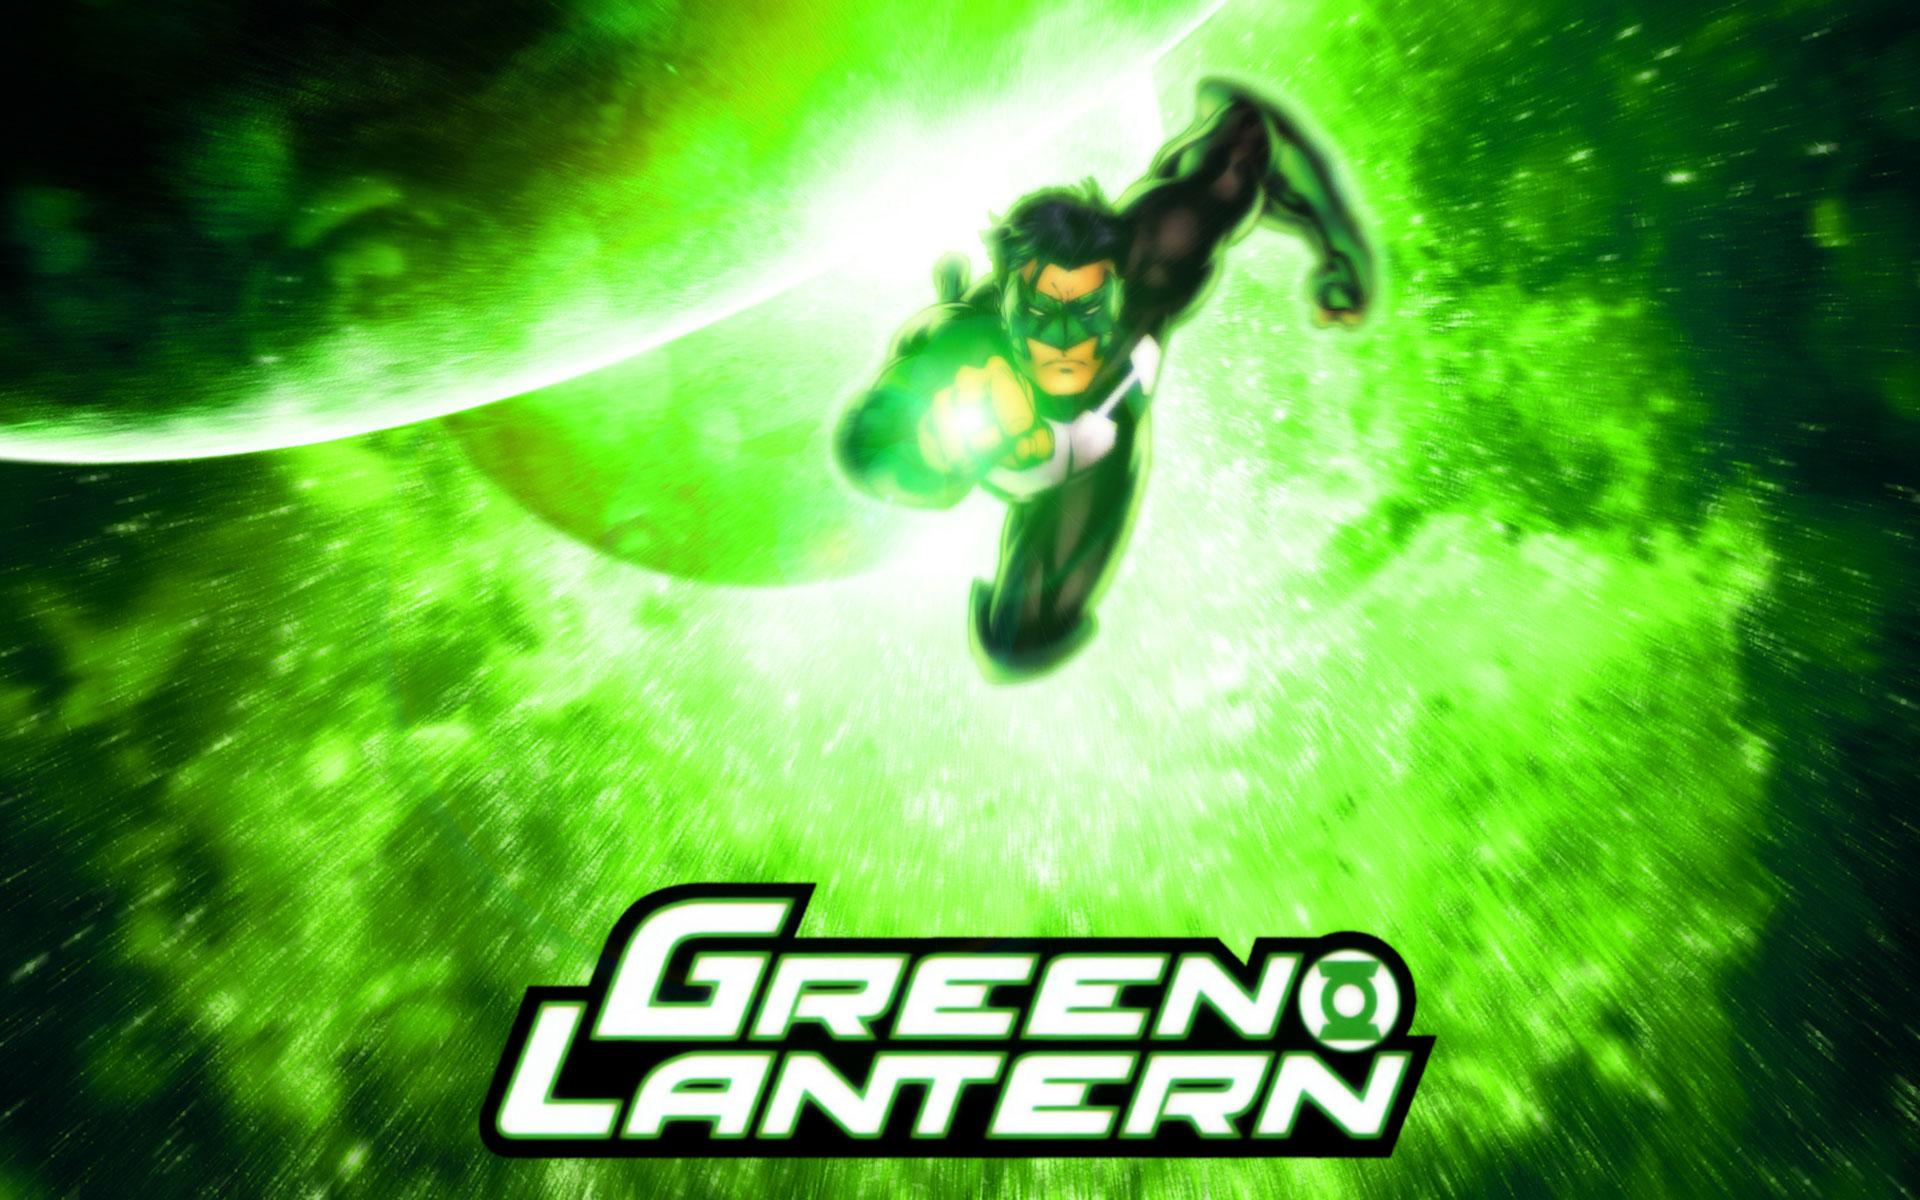 1000+ images about Green Lantern on Pinterest   Green lantern